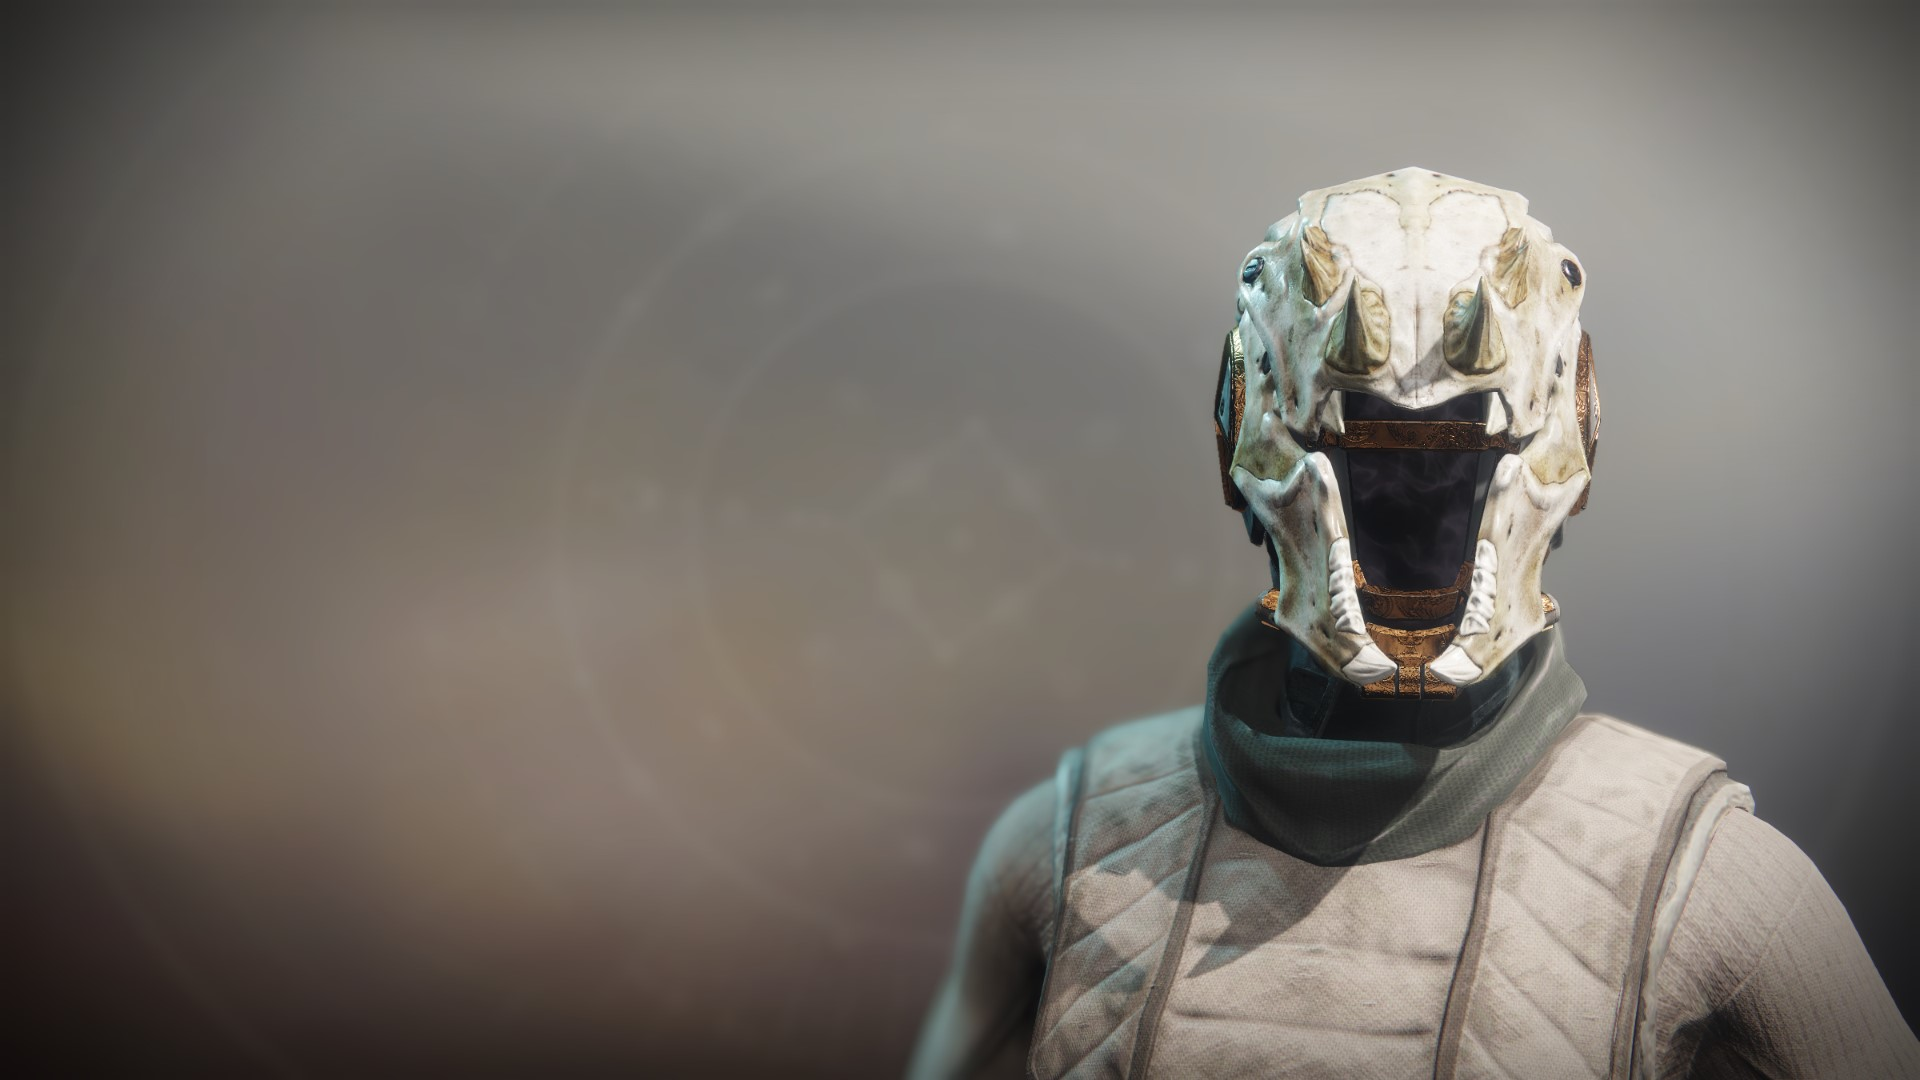 An in-game render of the Skull of Dire Ahamkara.